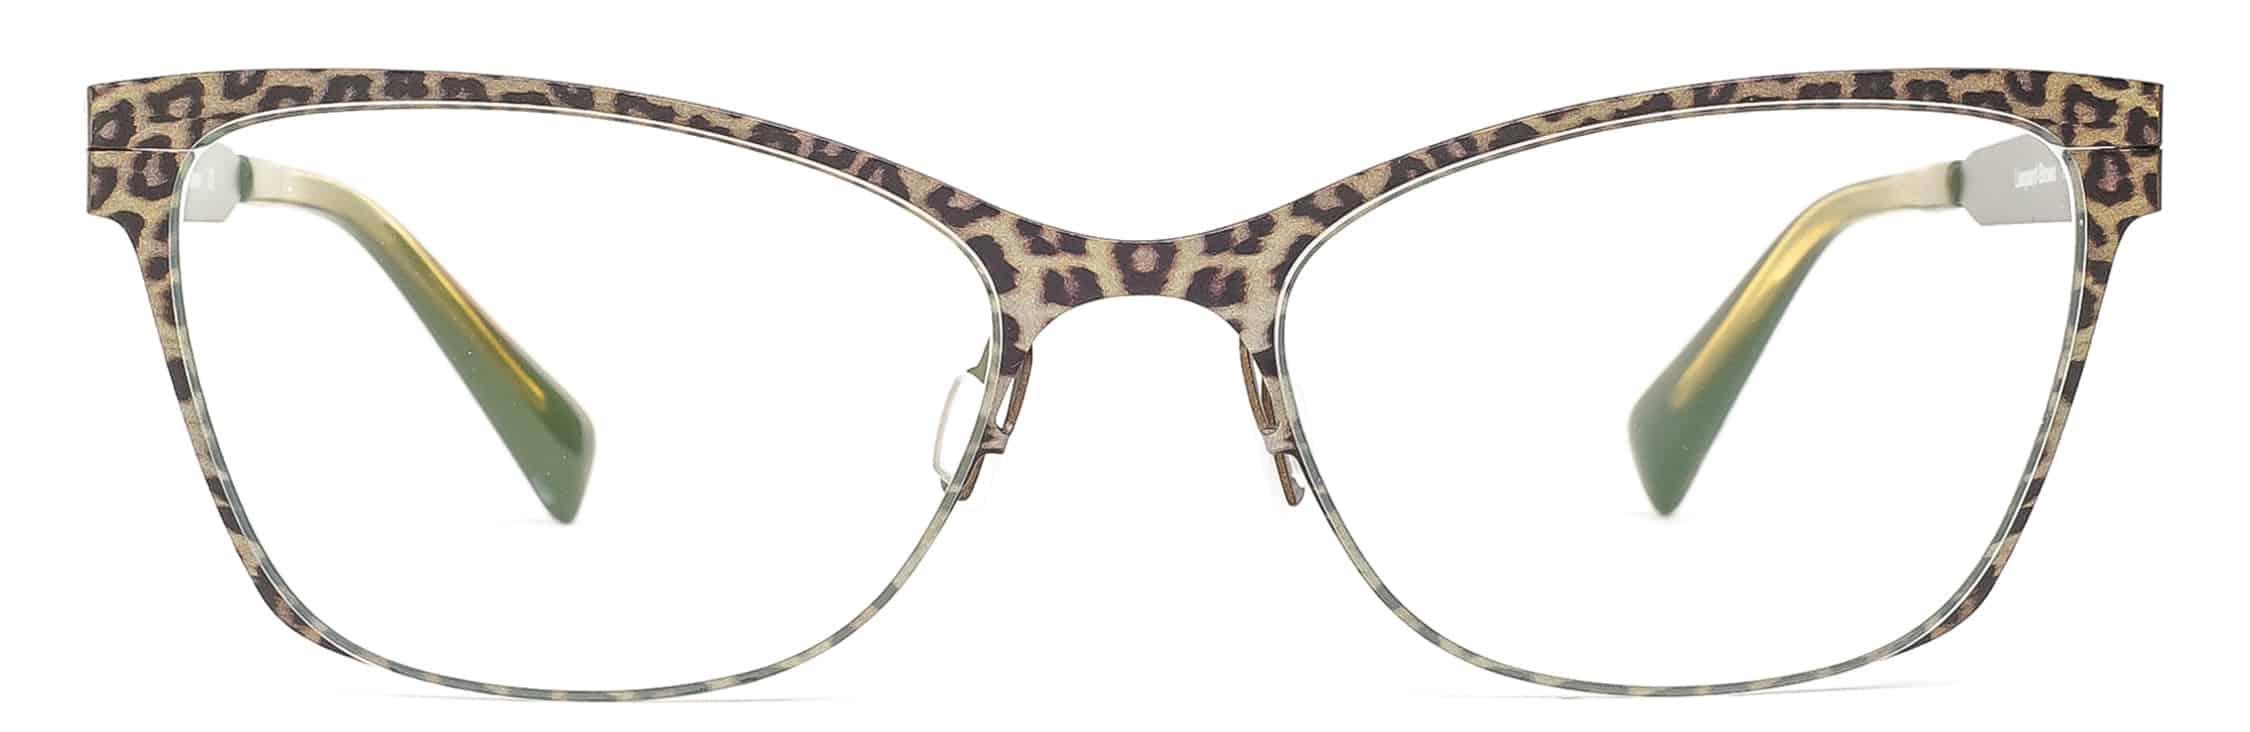 Zero G Eyewear